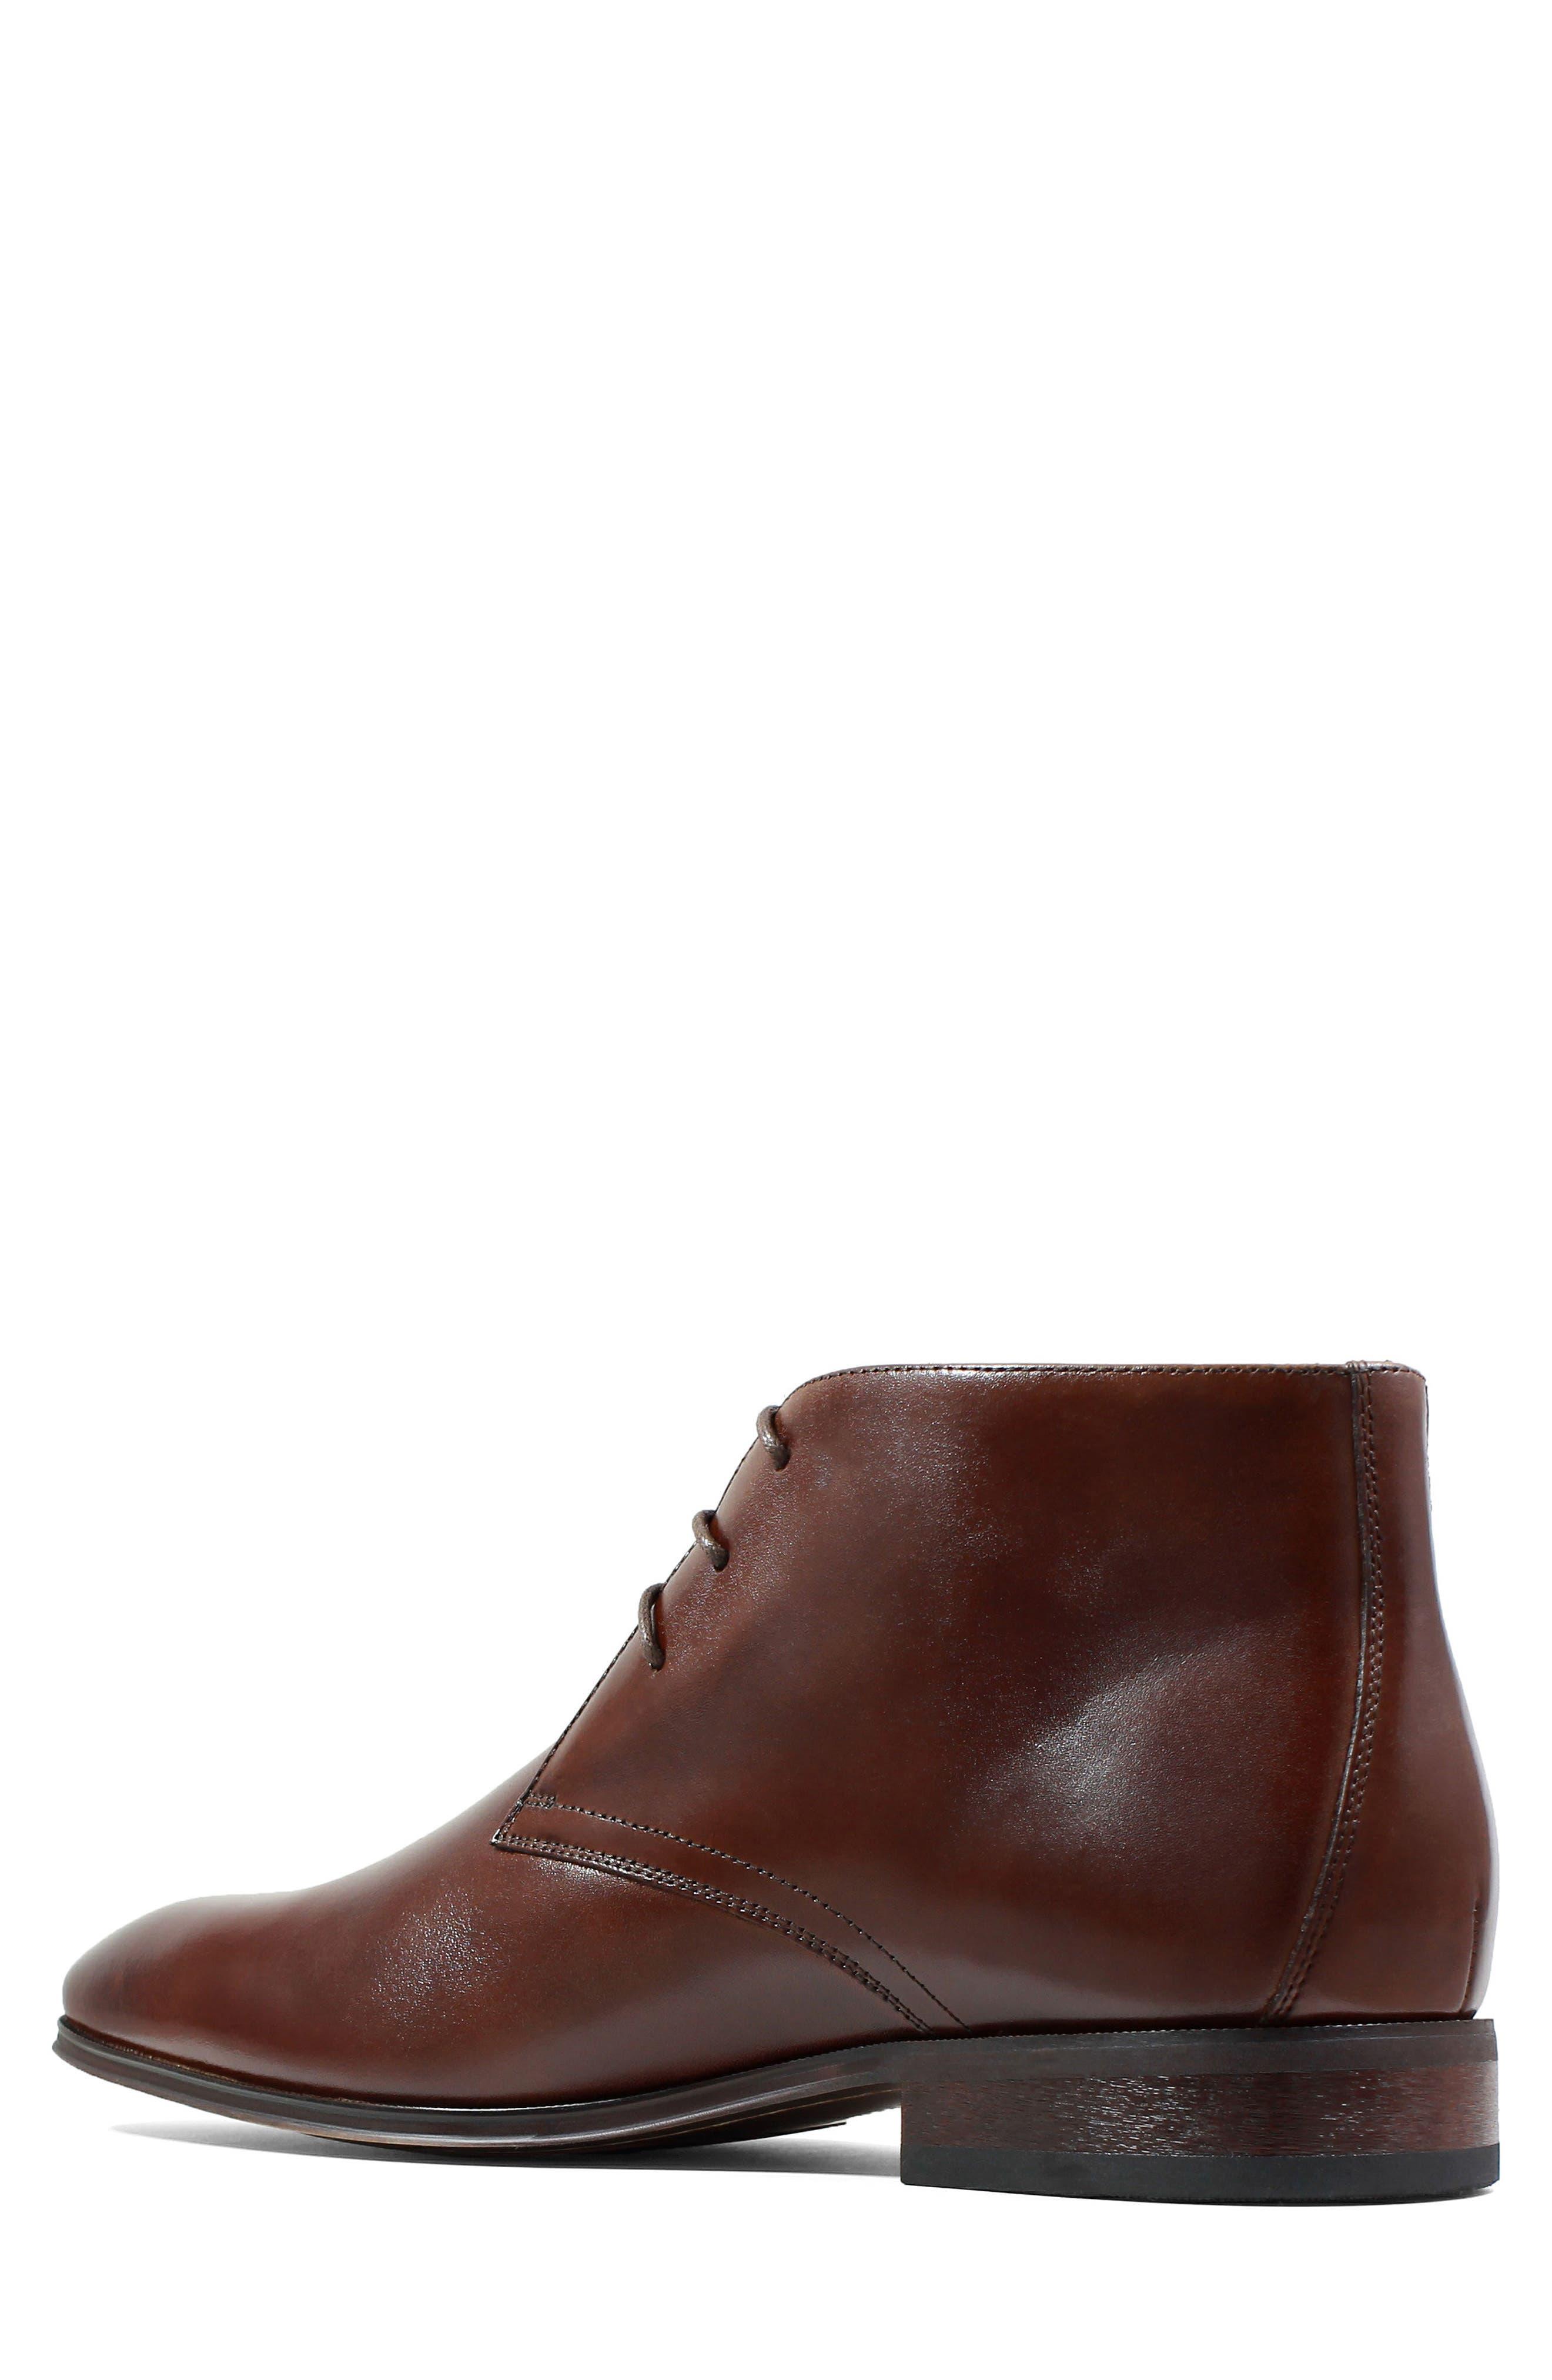 Corbetta Chukka Boot,                             Alternate thumbnail 2, color,                             Cognac Leather